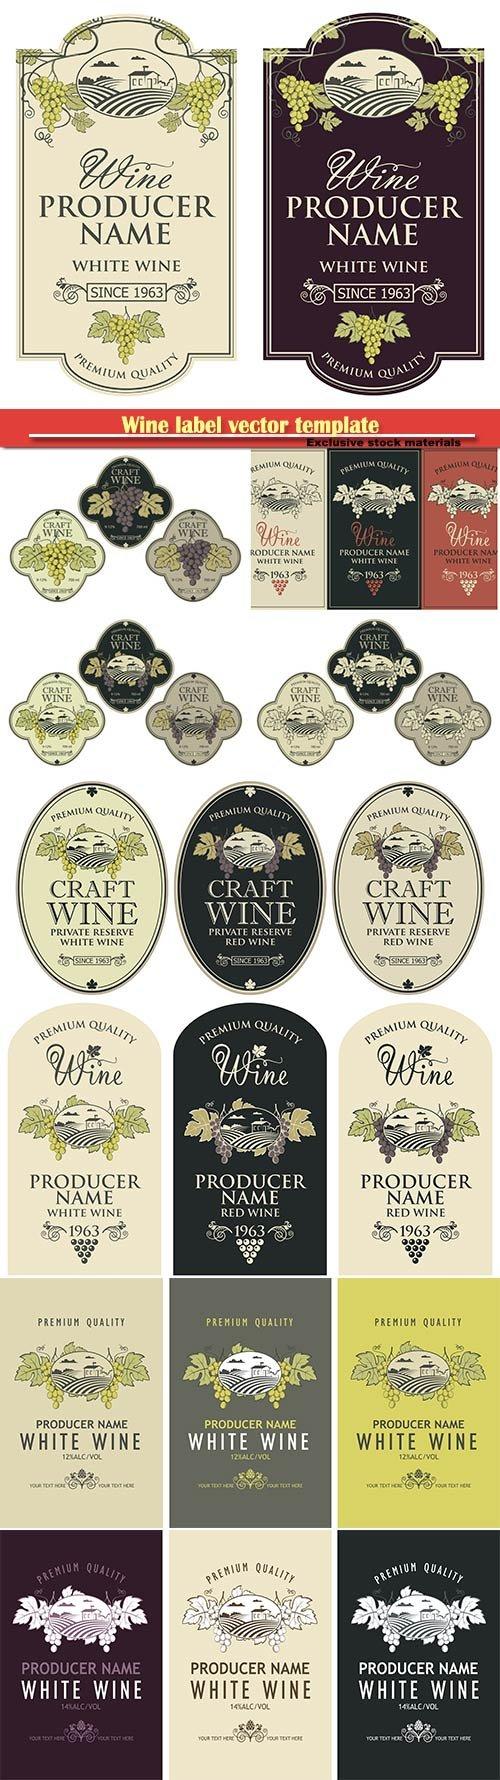 Wine label vector template